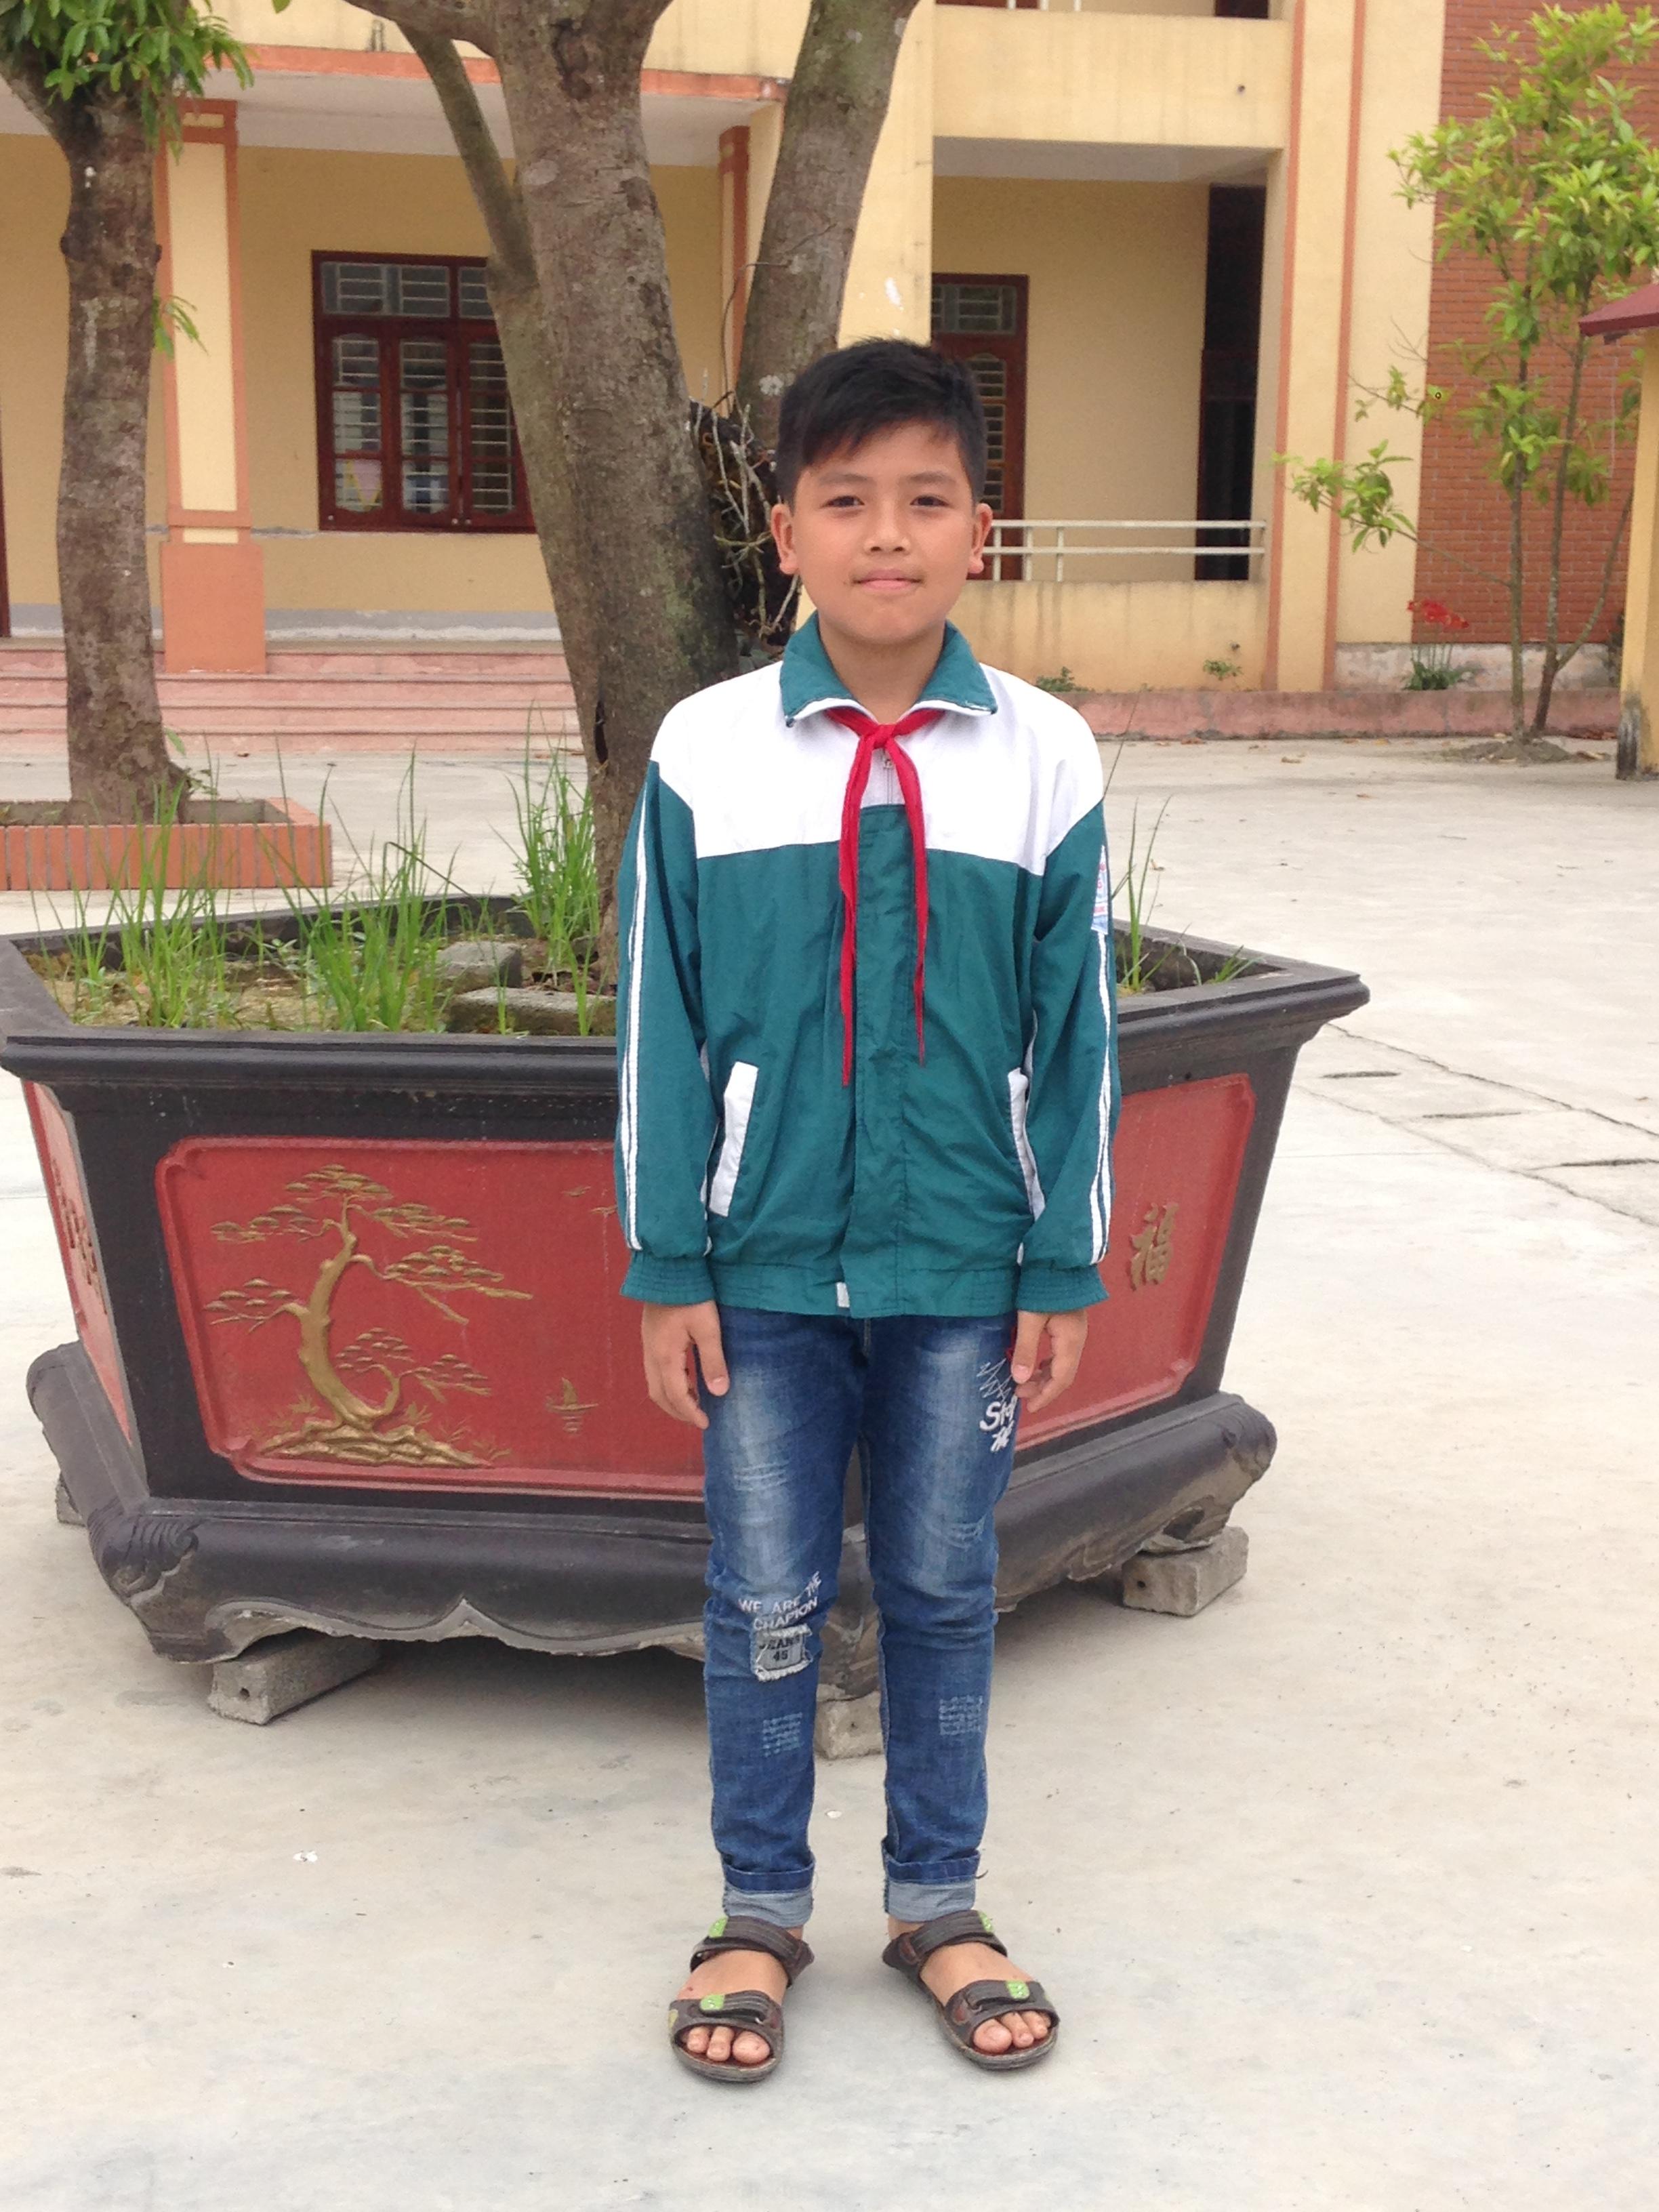 LUDDENS_PHAM Van Tuan